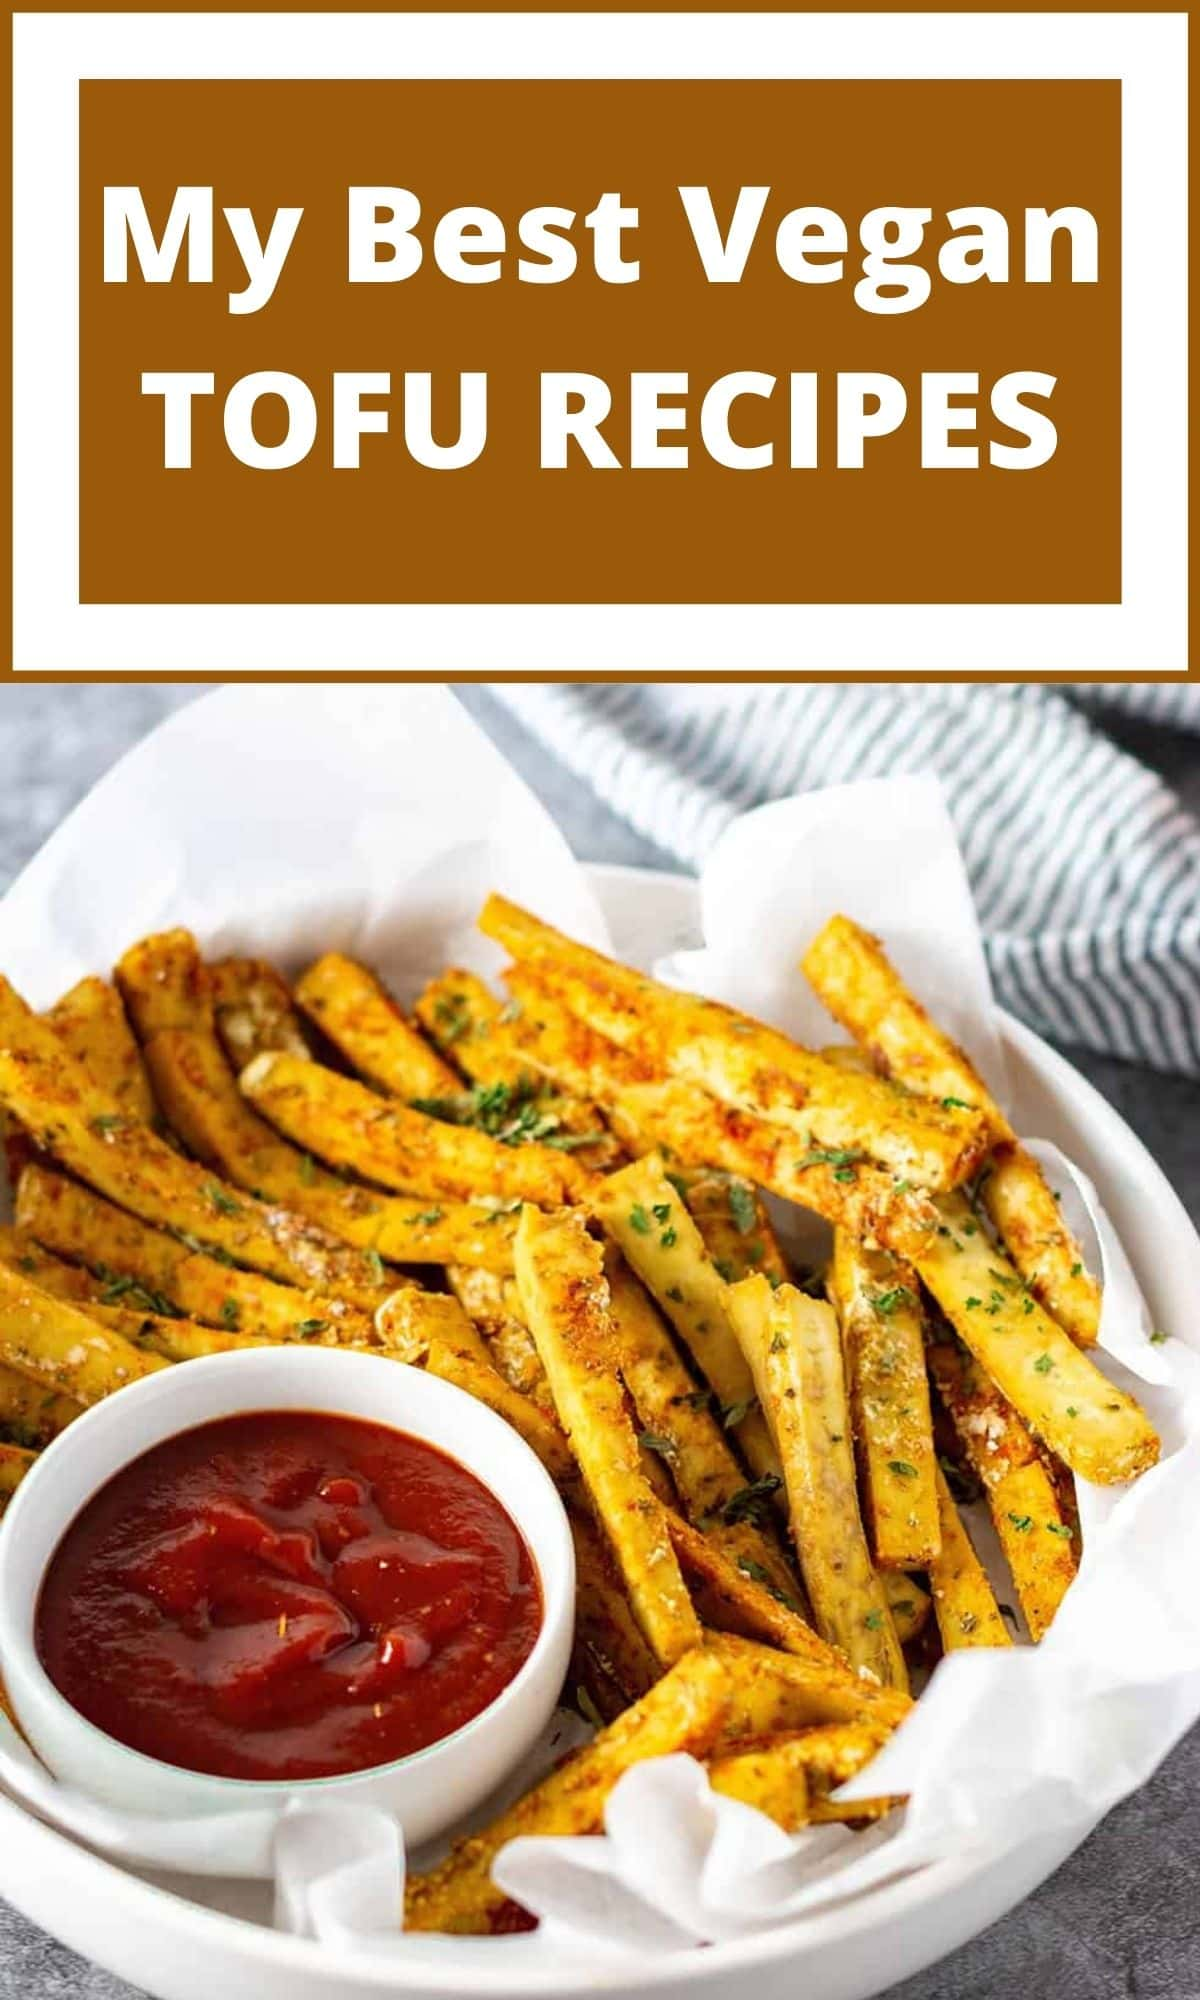 My Best Vegan Tofu Recipes